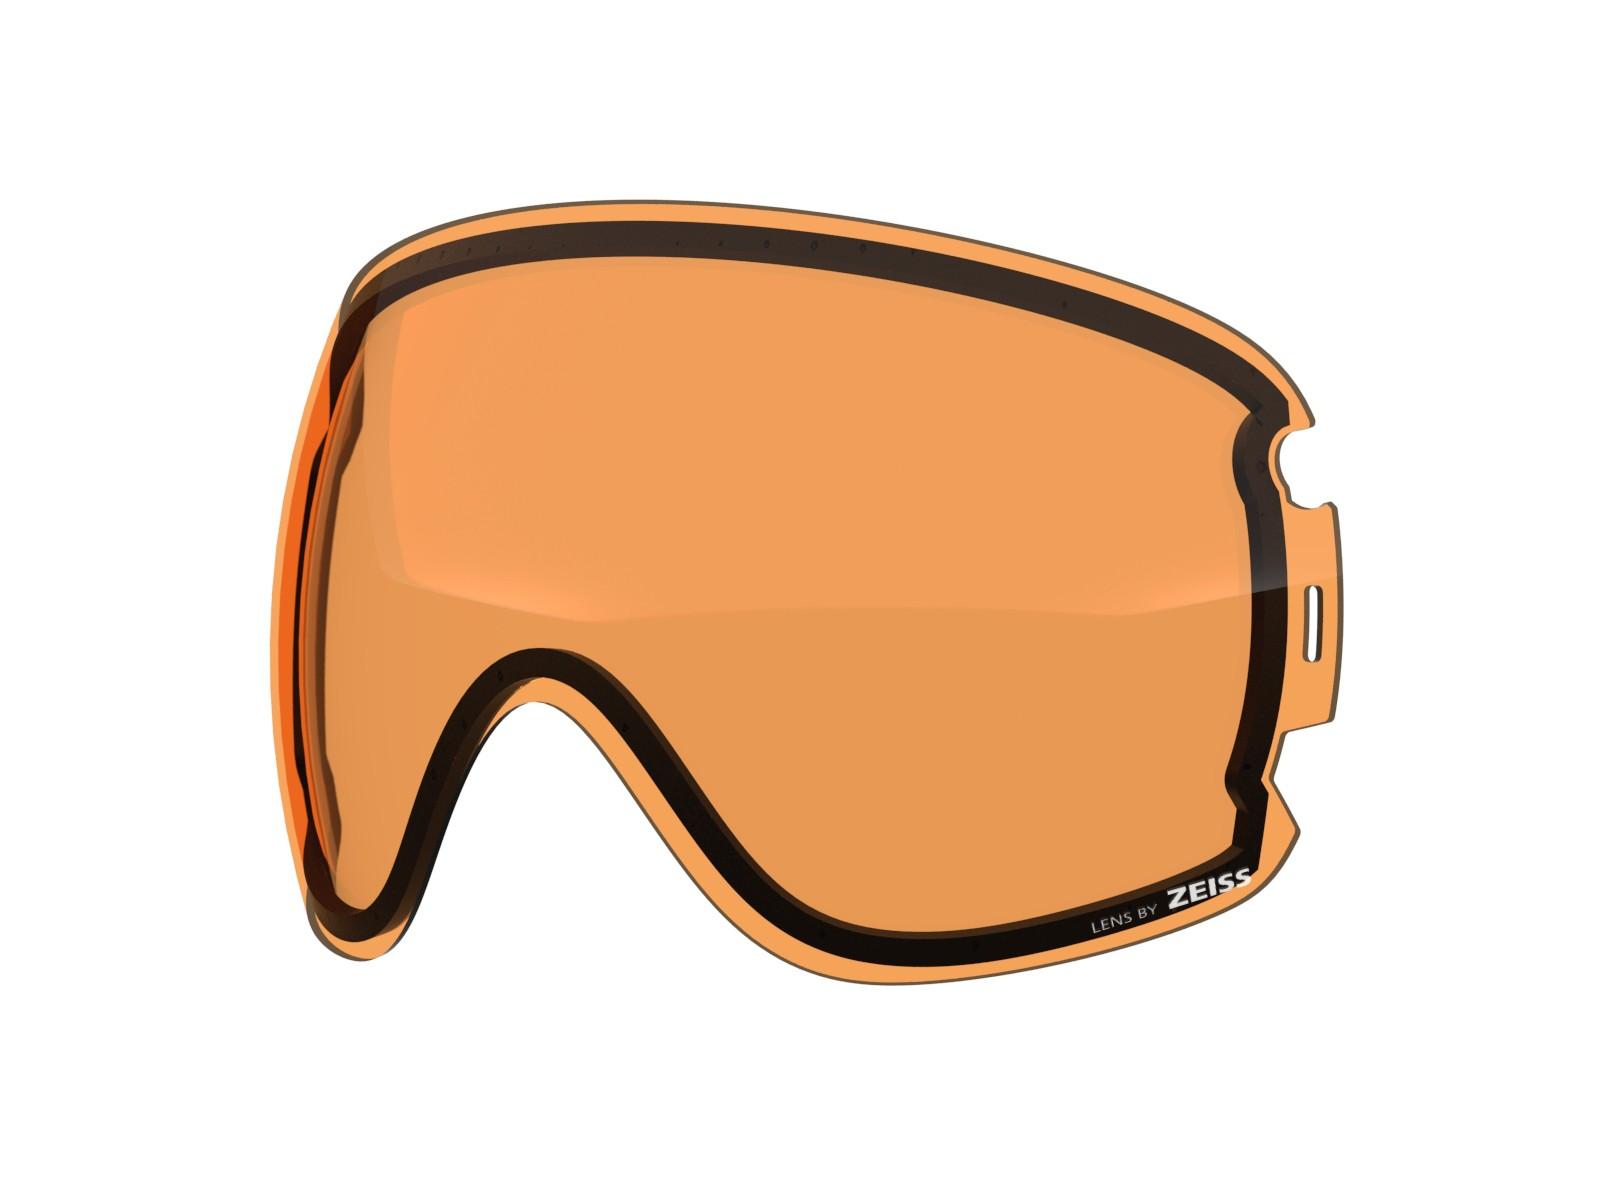 Persimmon lens for Lente per Open xl goggle